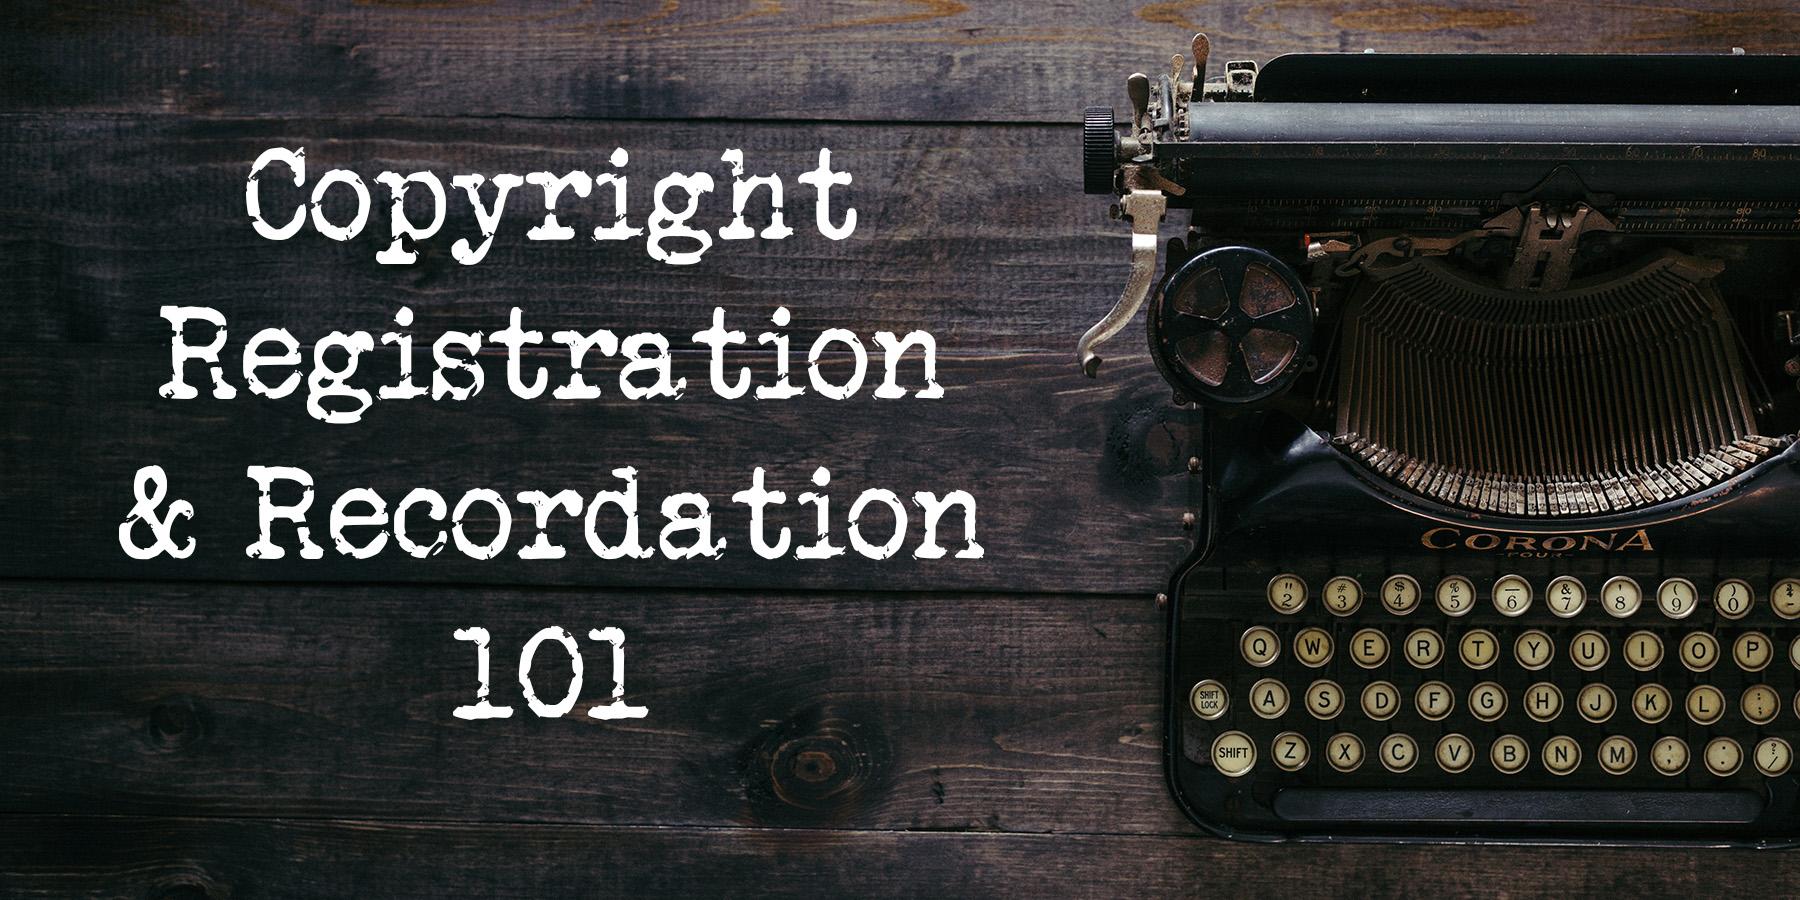 Copyright Registration and Recordation 101